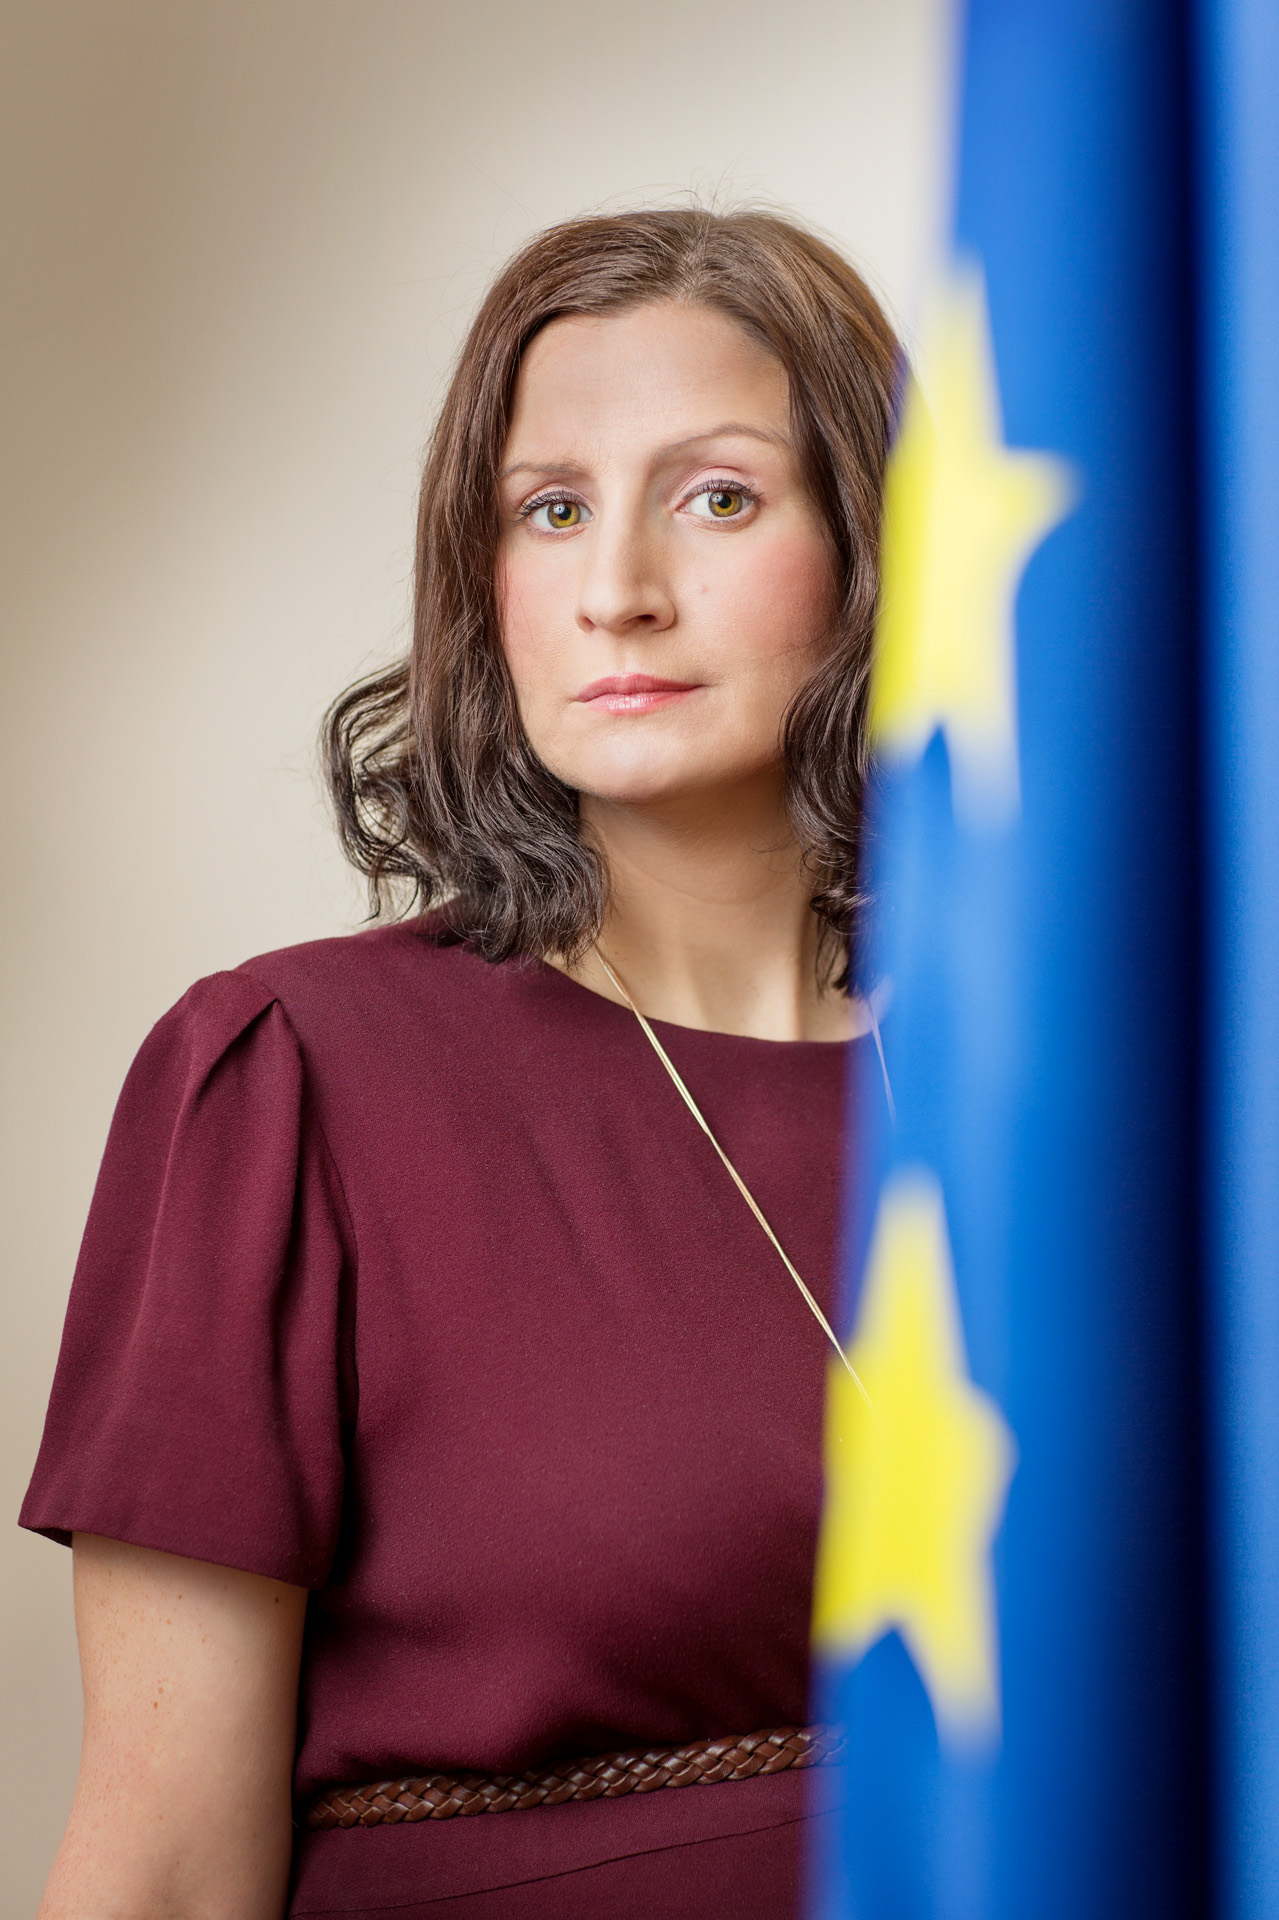 Birgitta_Ohlsson_EU_minister